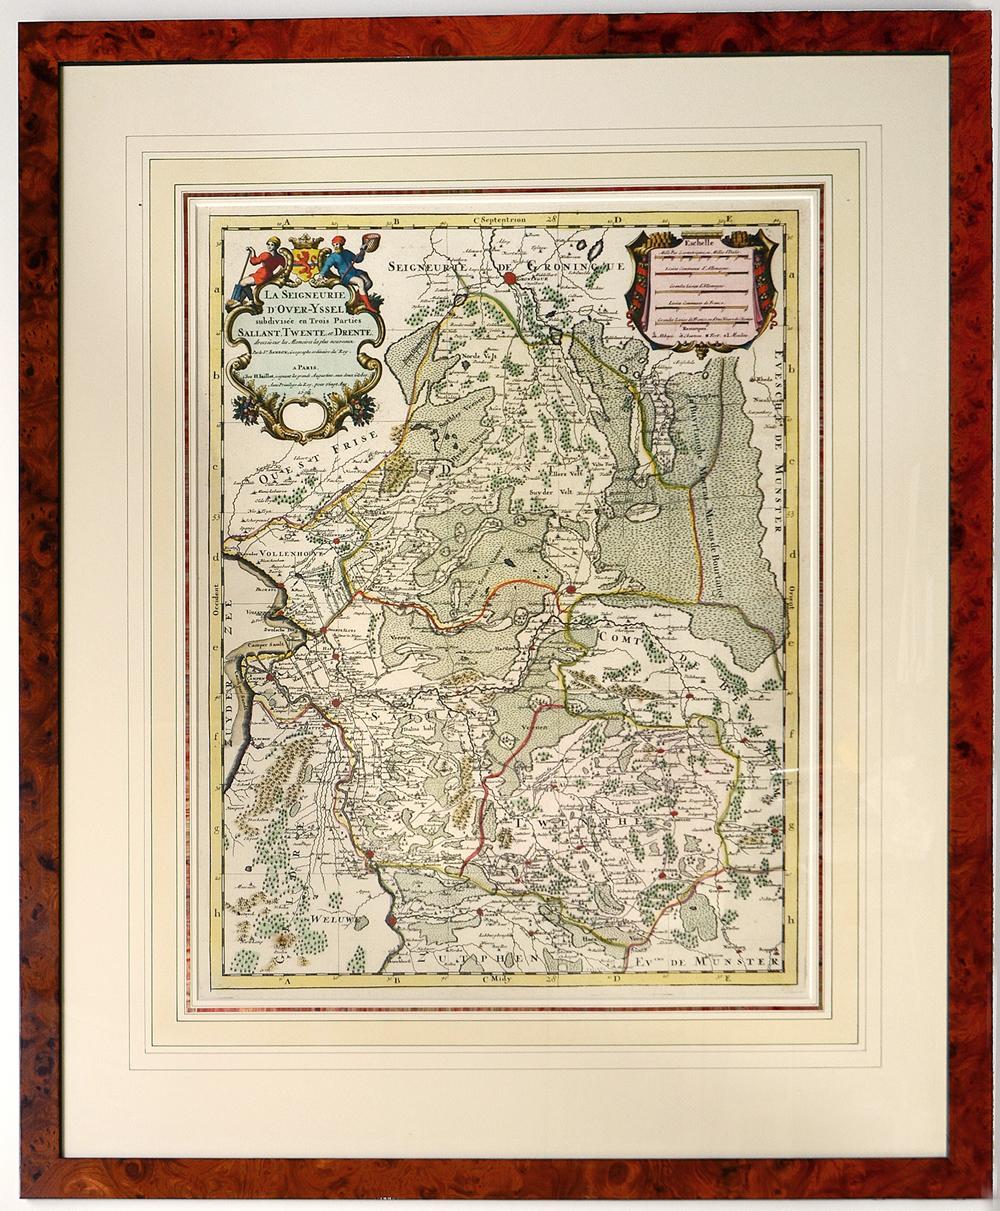 La Seigneurie d'Overijssel 1696